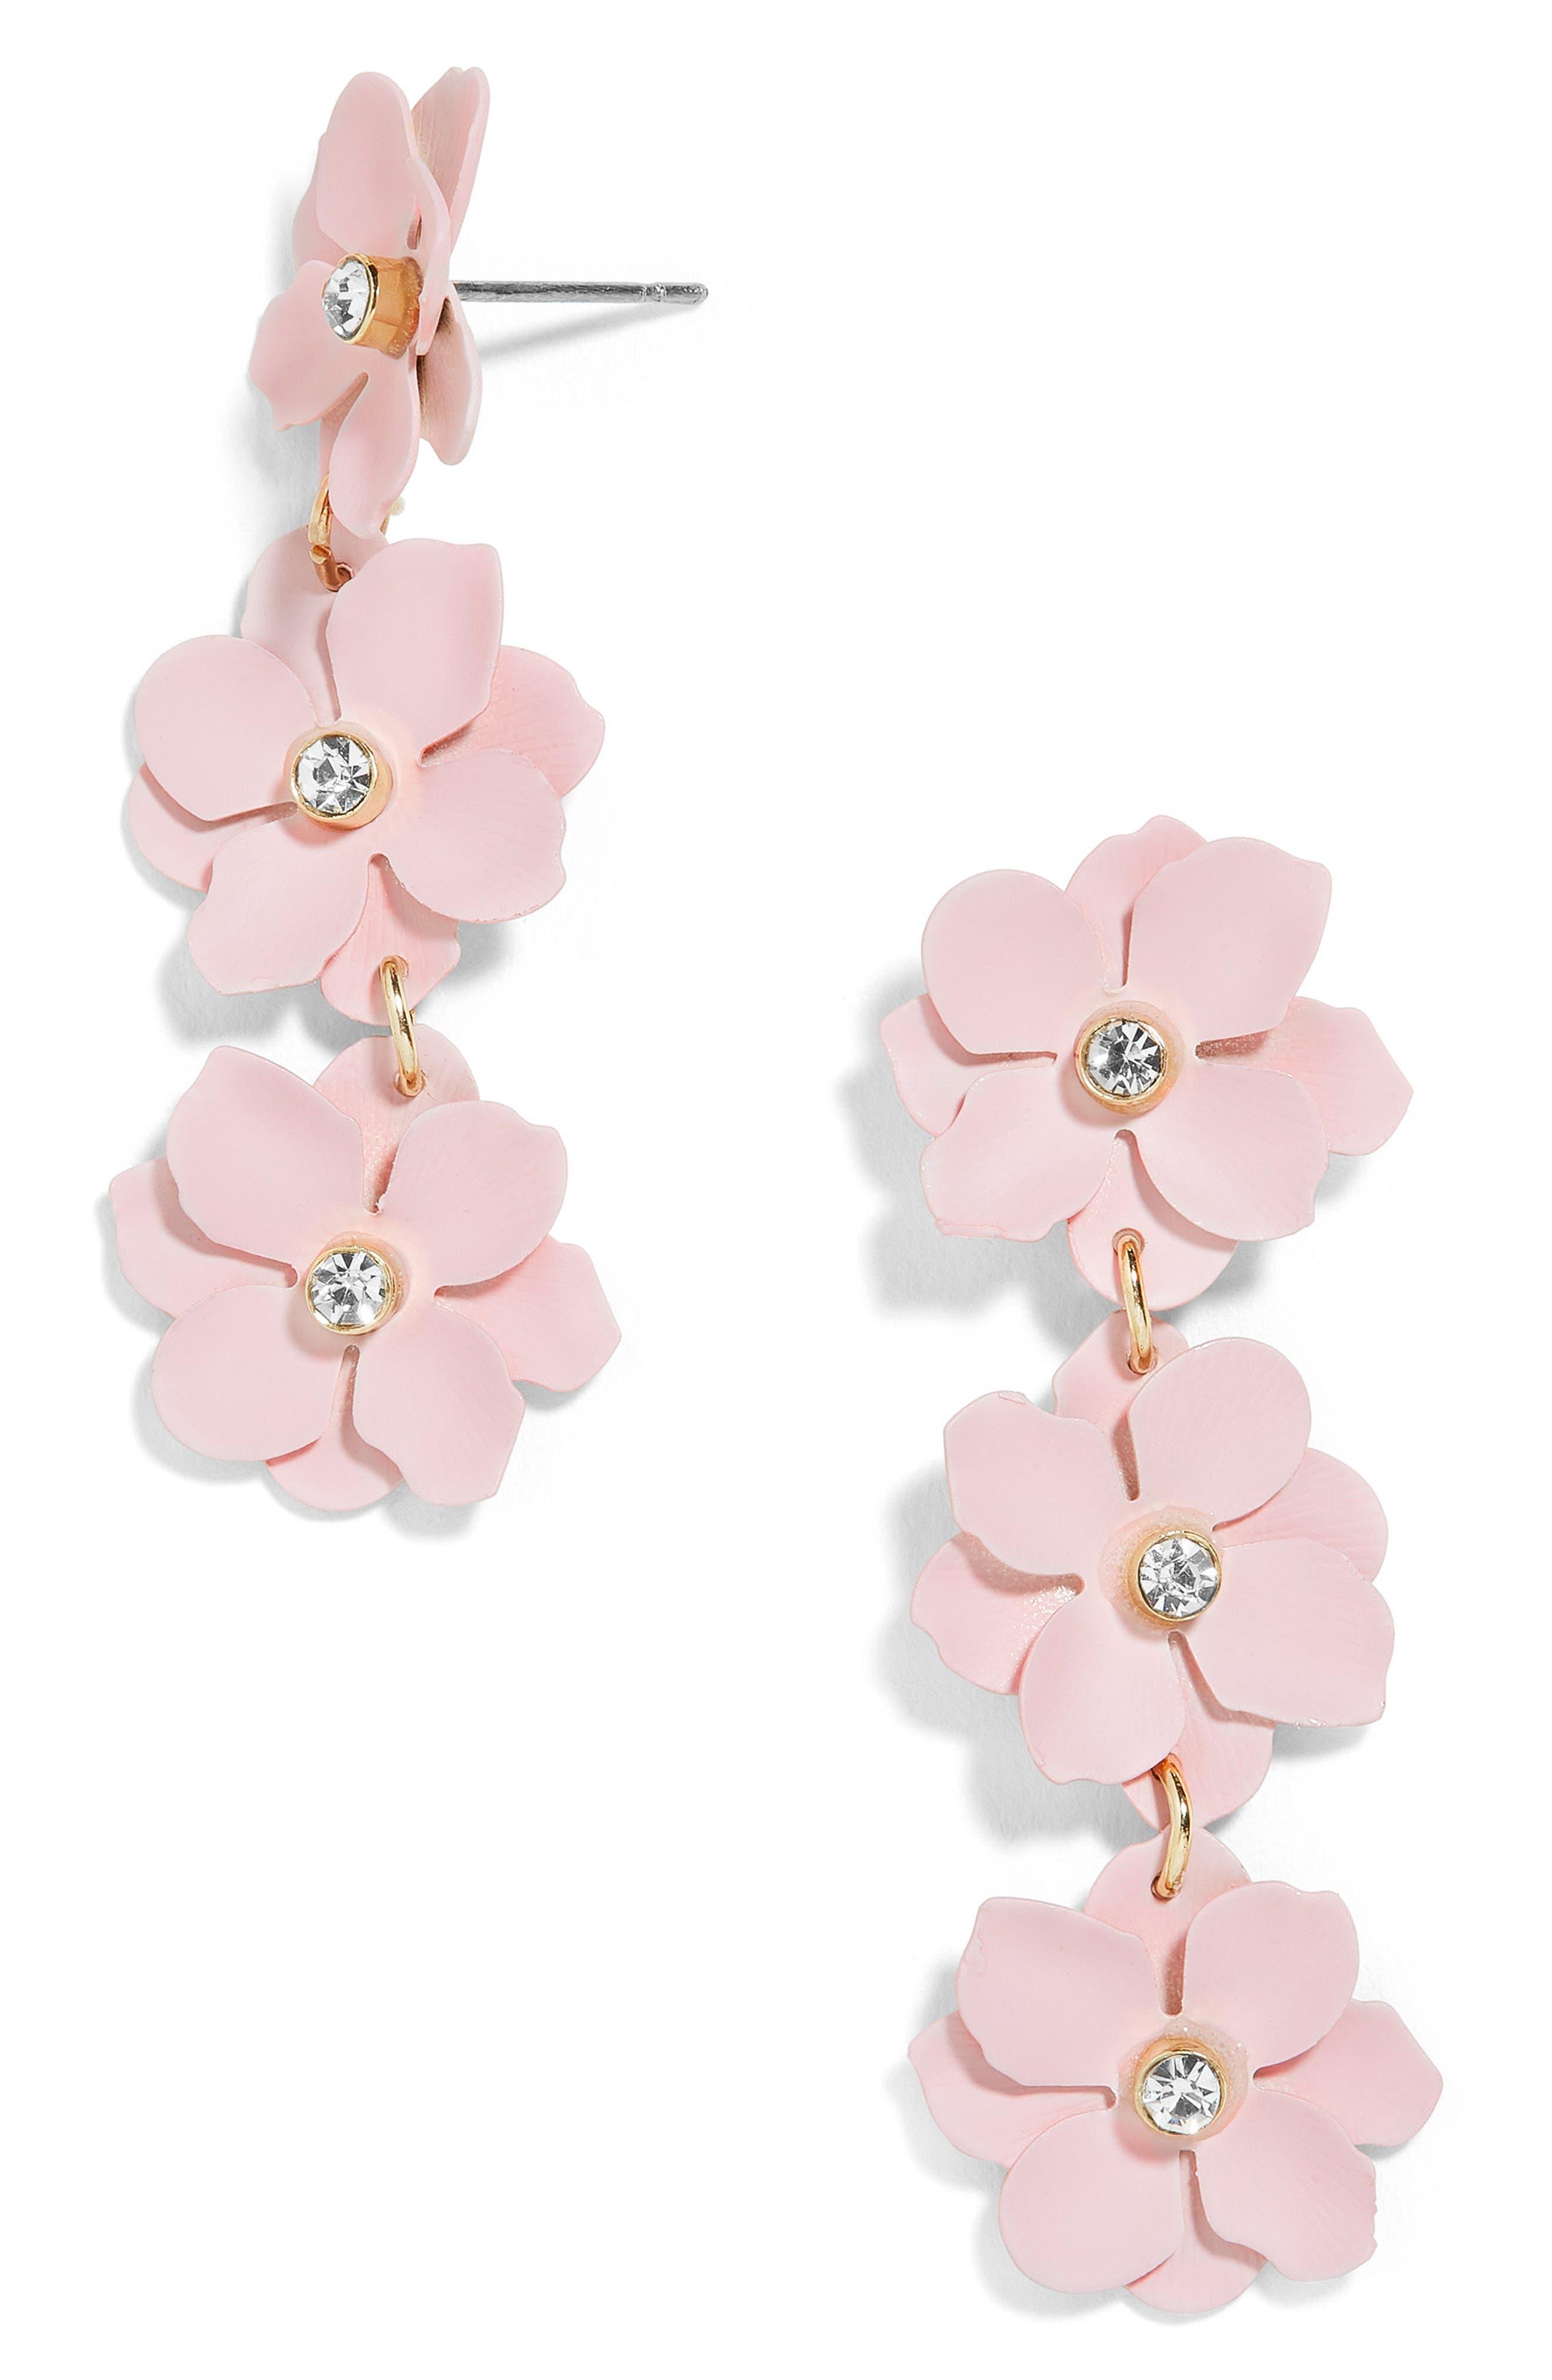 Kimi Flower Drop Earrings,                             Main thumbnail 1, color,                             Pink